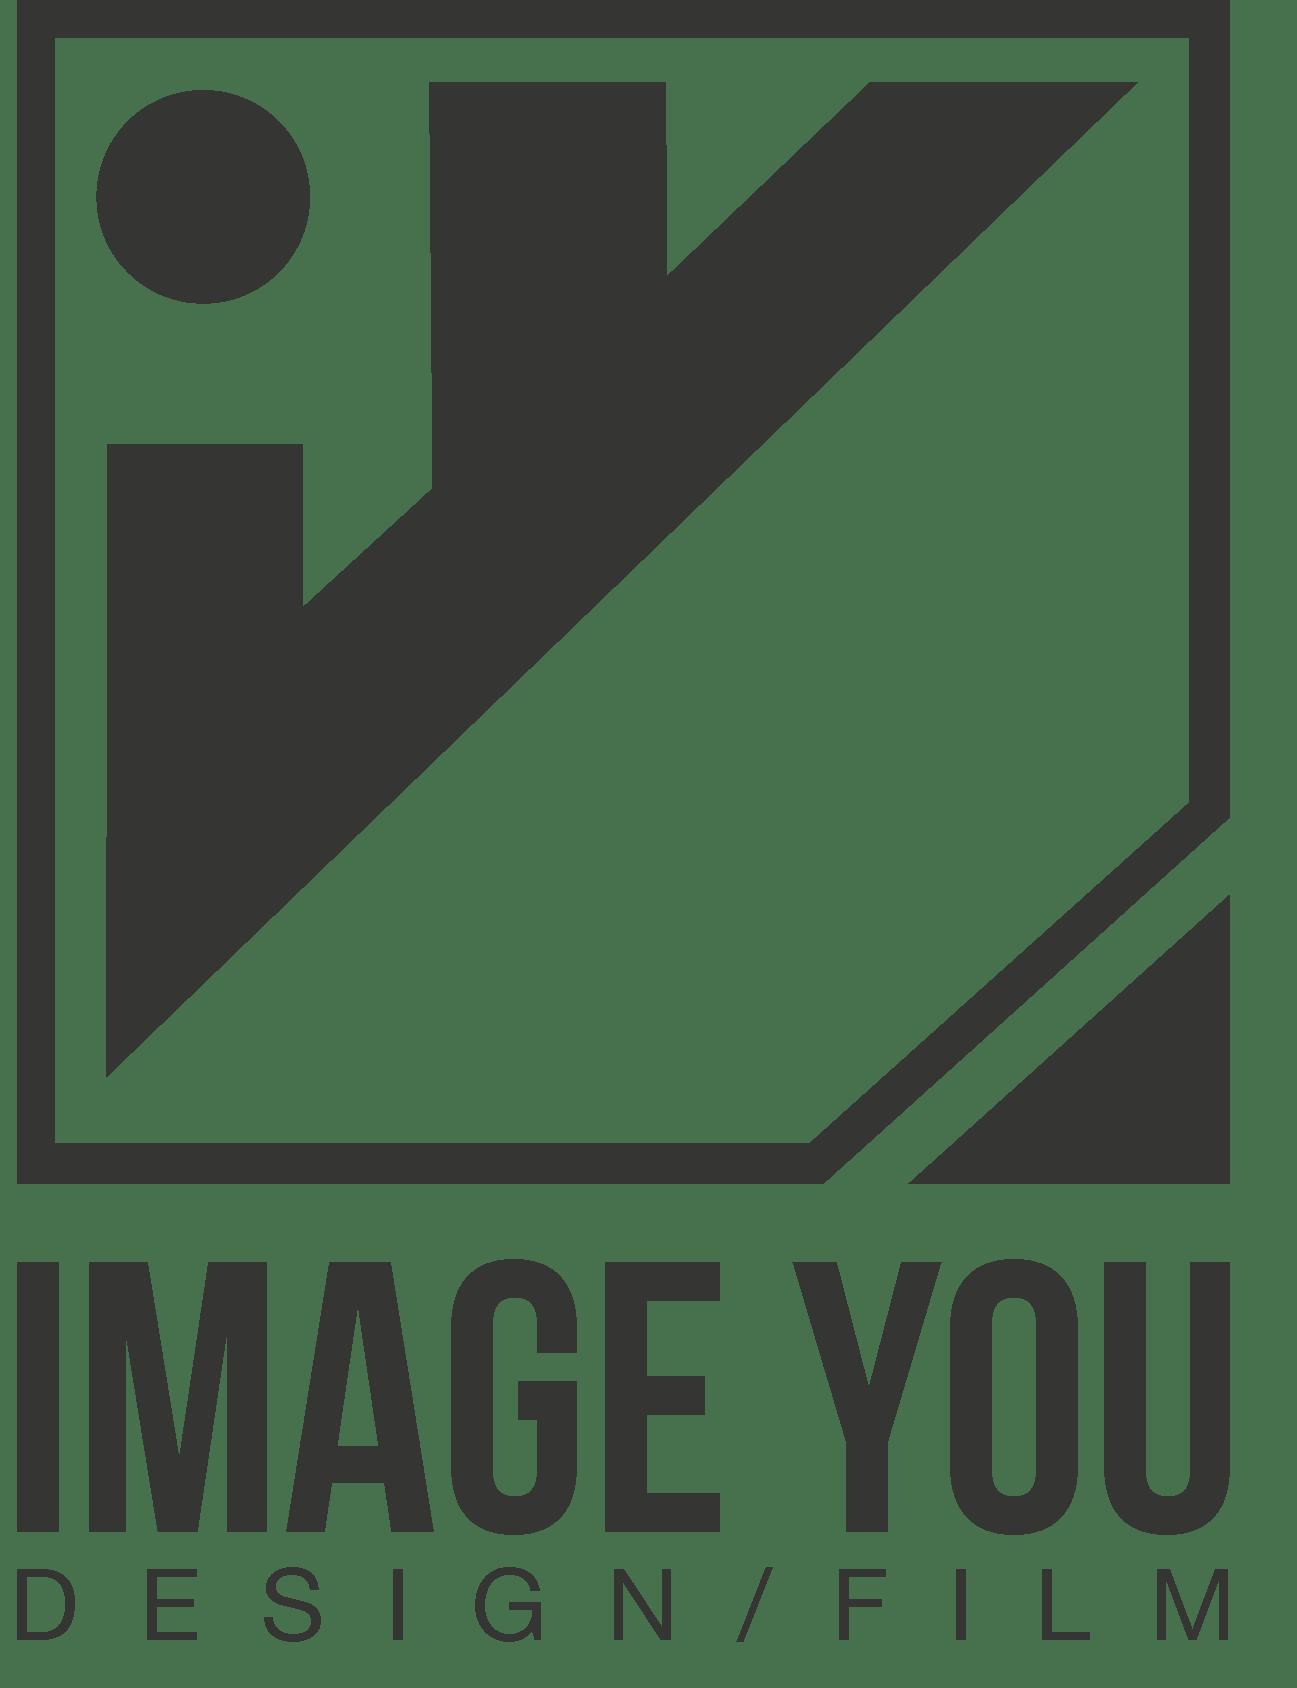 Image You